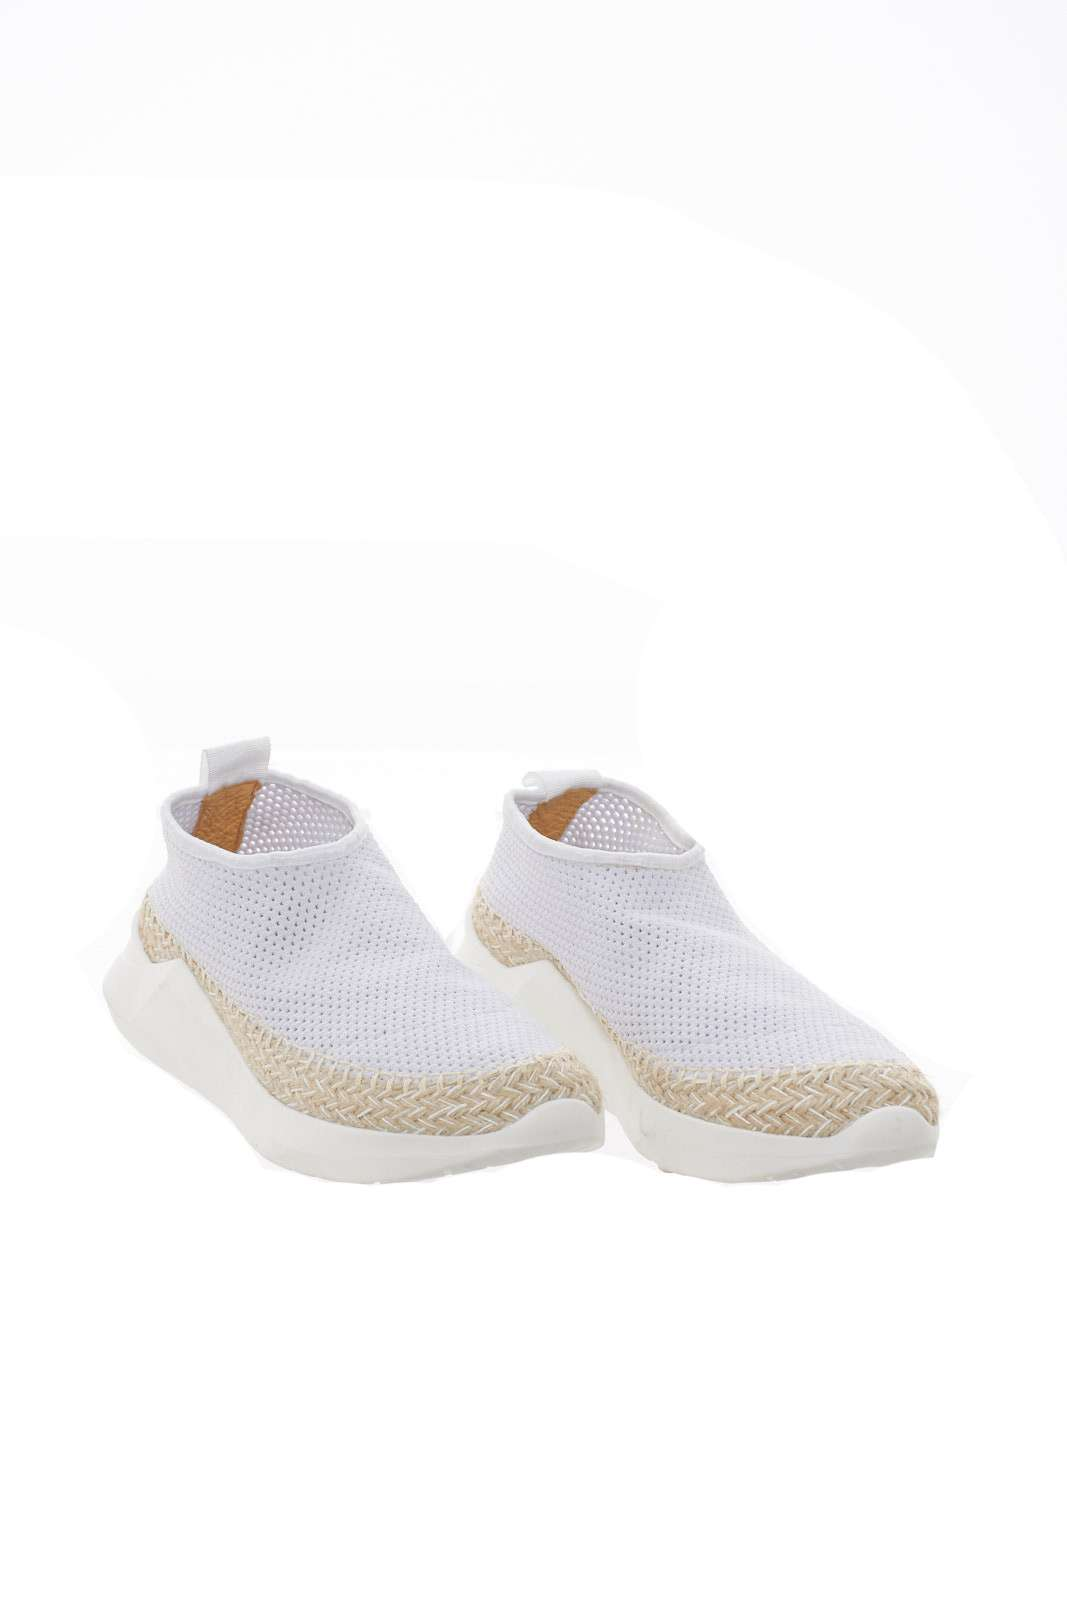 https://www.parmax.com/media/catalog/product/a/i/PE-outlet_parmax-scarpe-donna-PF16-117-C.jpg